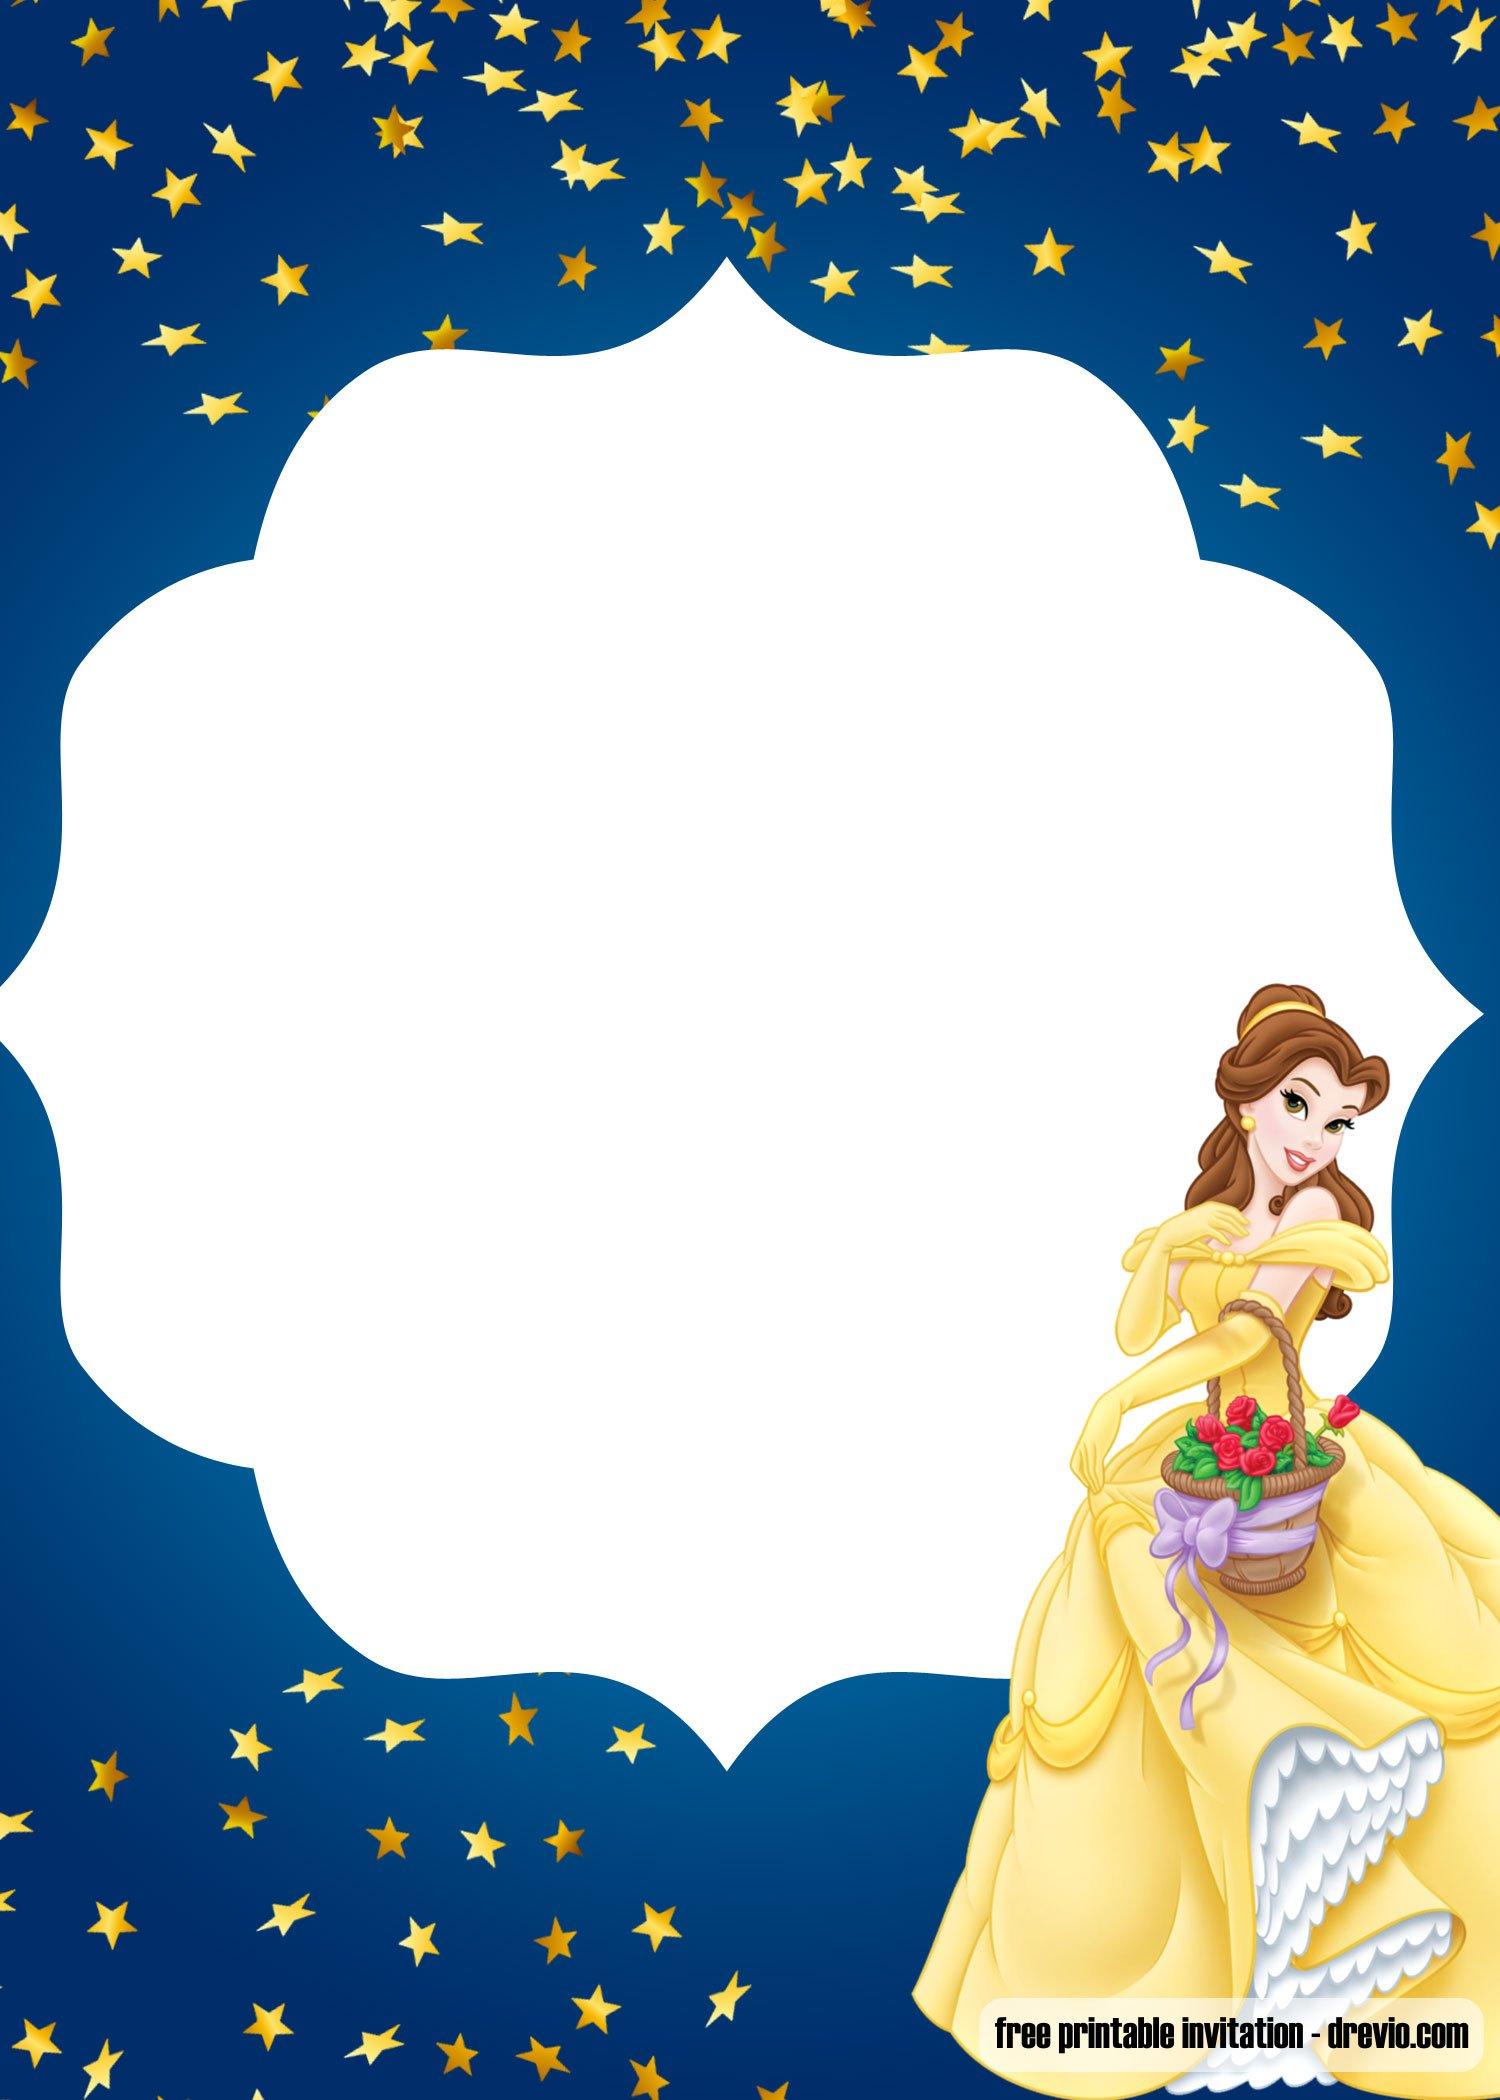 Free Princess Beauty And The Beast Invitation Templates